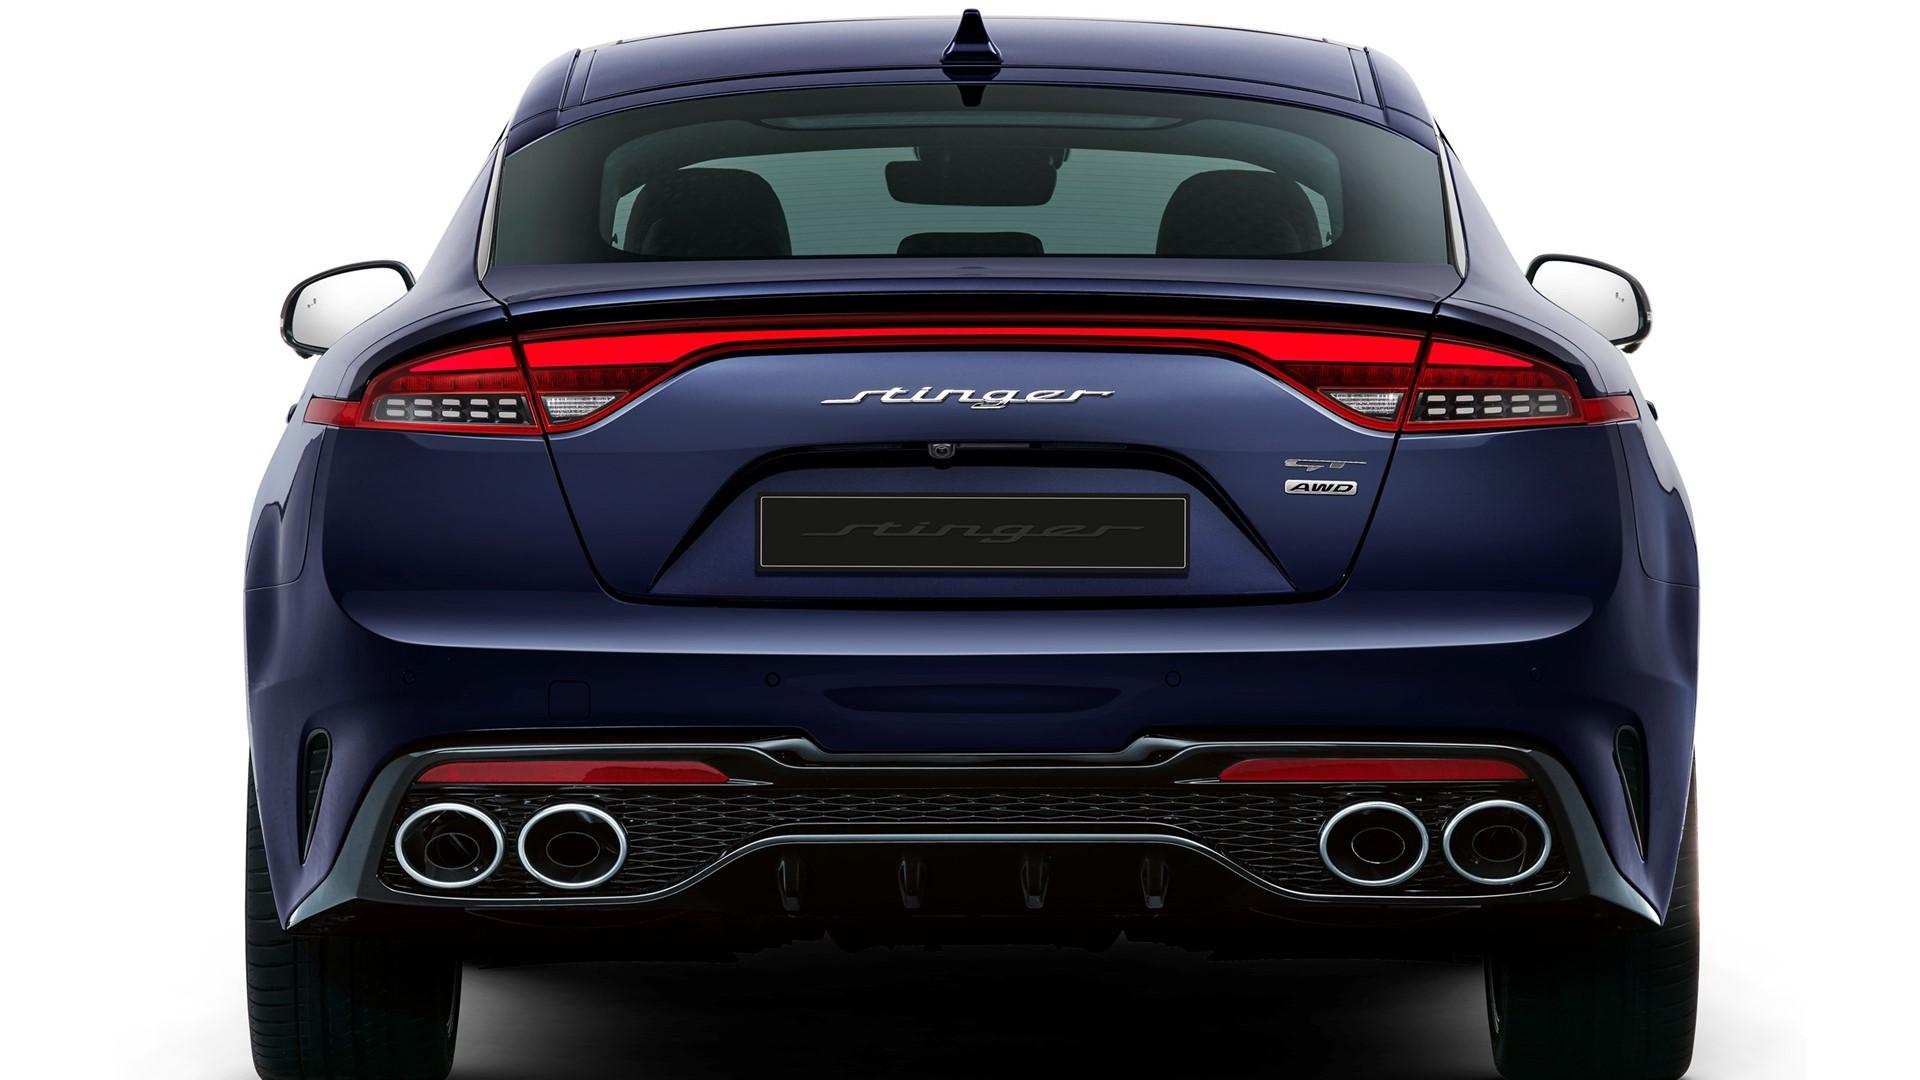 Kia reveals new design for fastback Stinger - Image 2